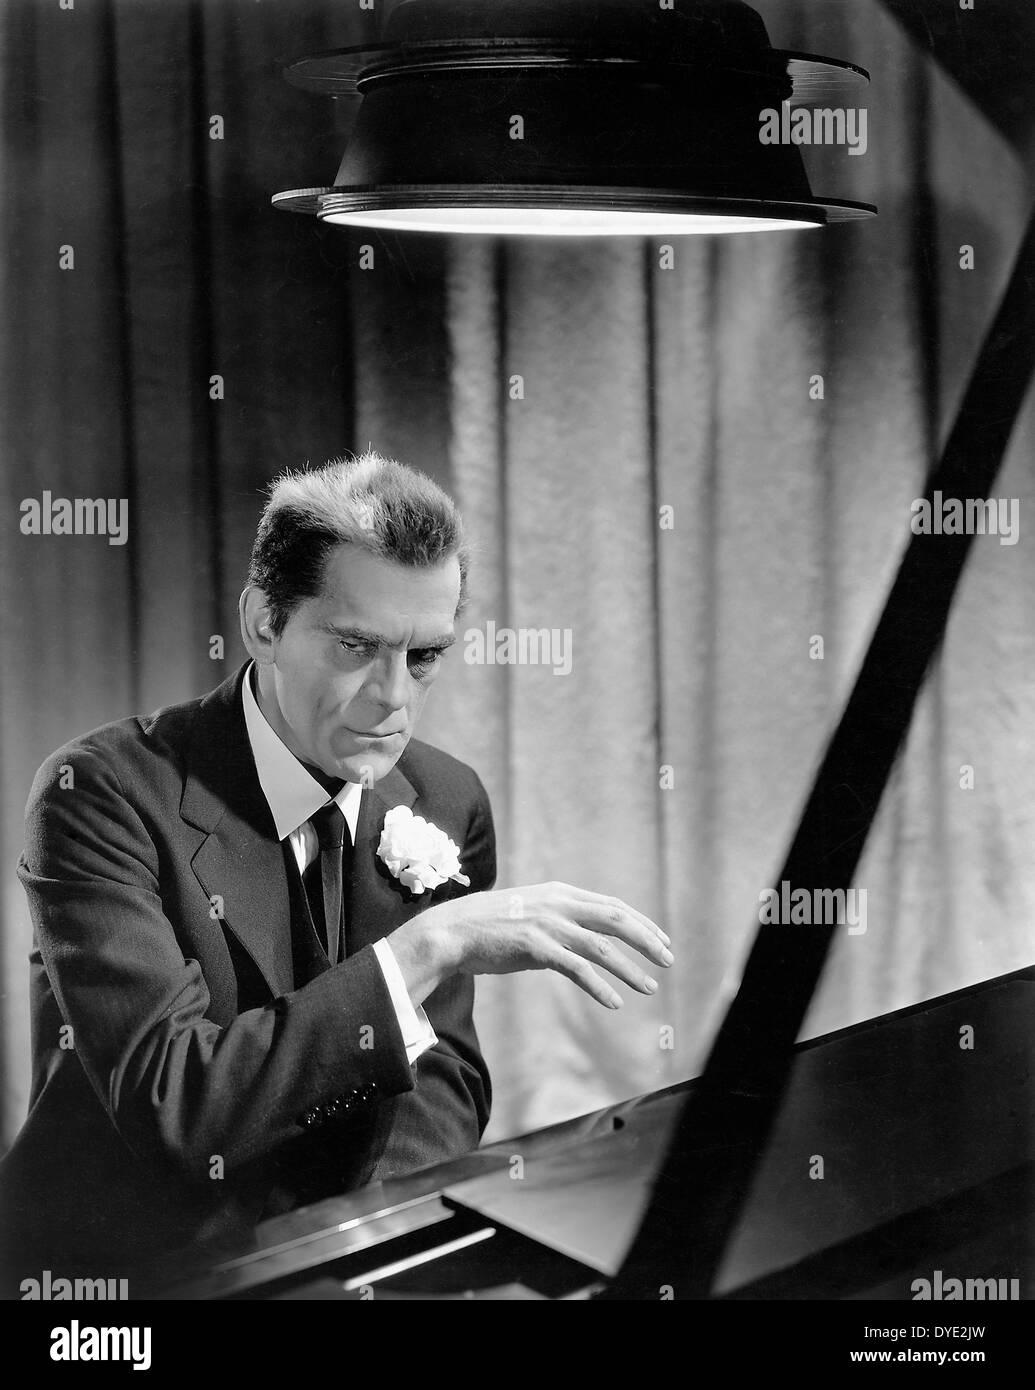 Boris Karloff, on-set of the Film, 'The Walking Dead', 1936 - Stock Image